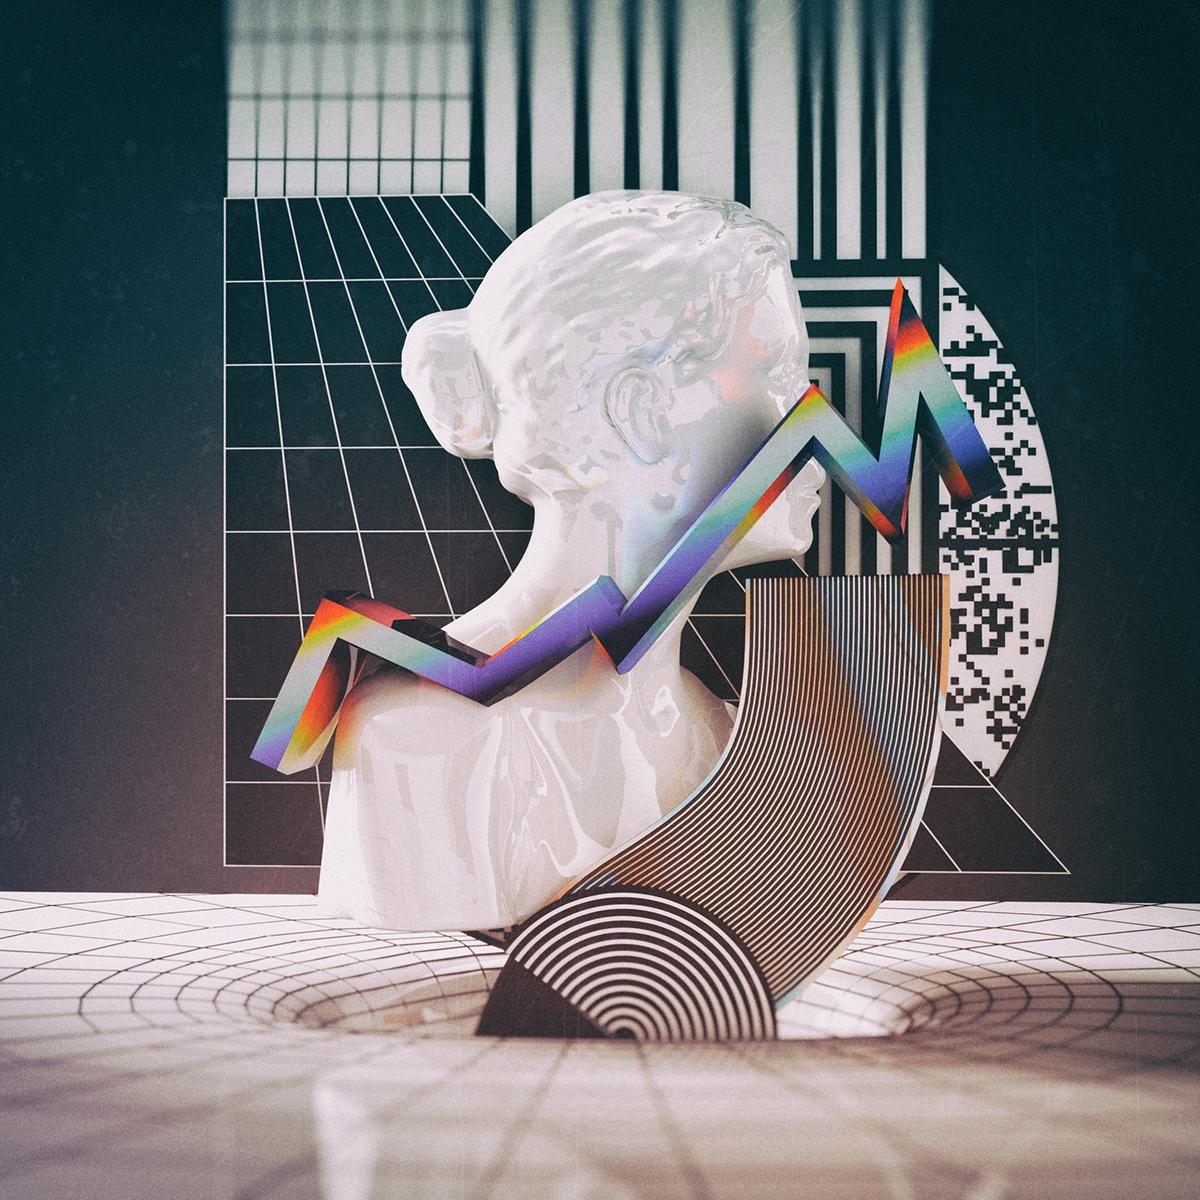 art creative artworks monthly 3dsmax FStorm design minimalist c4d cinema4d